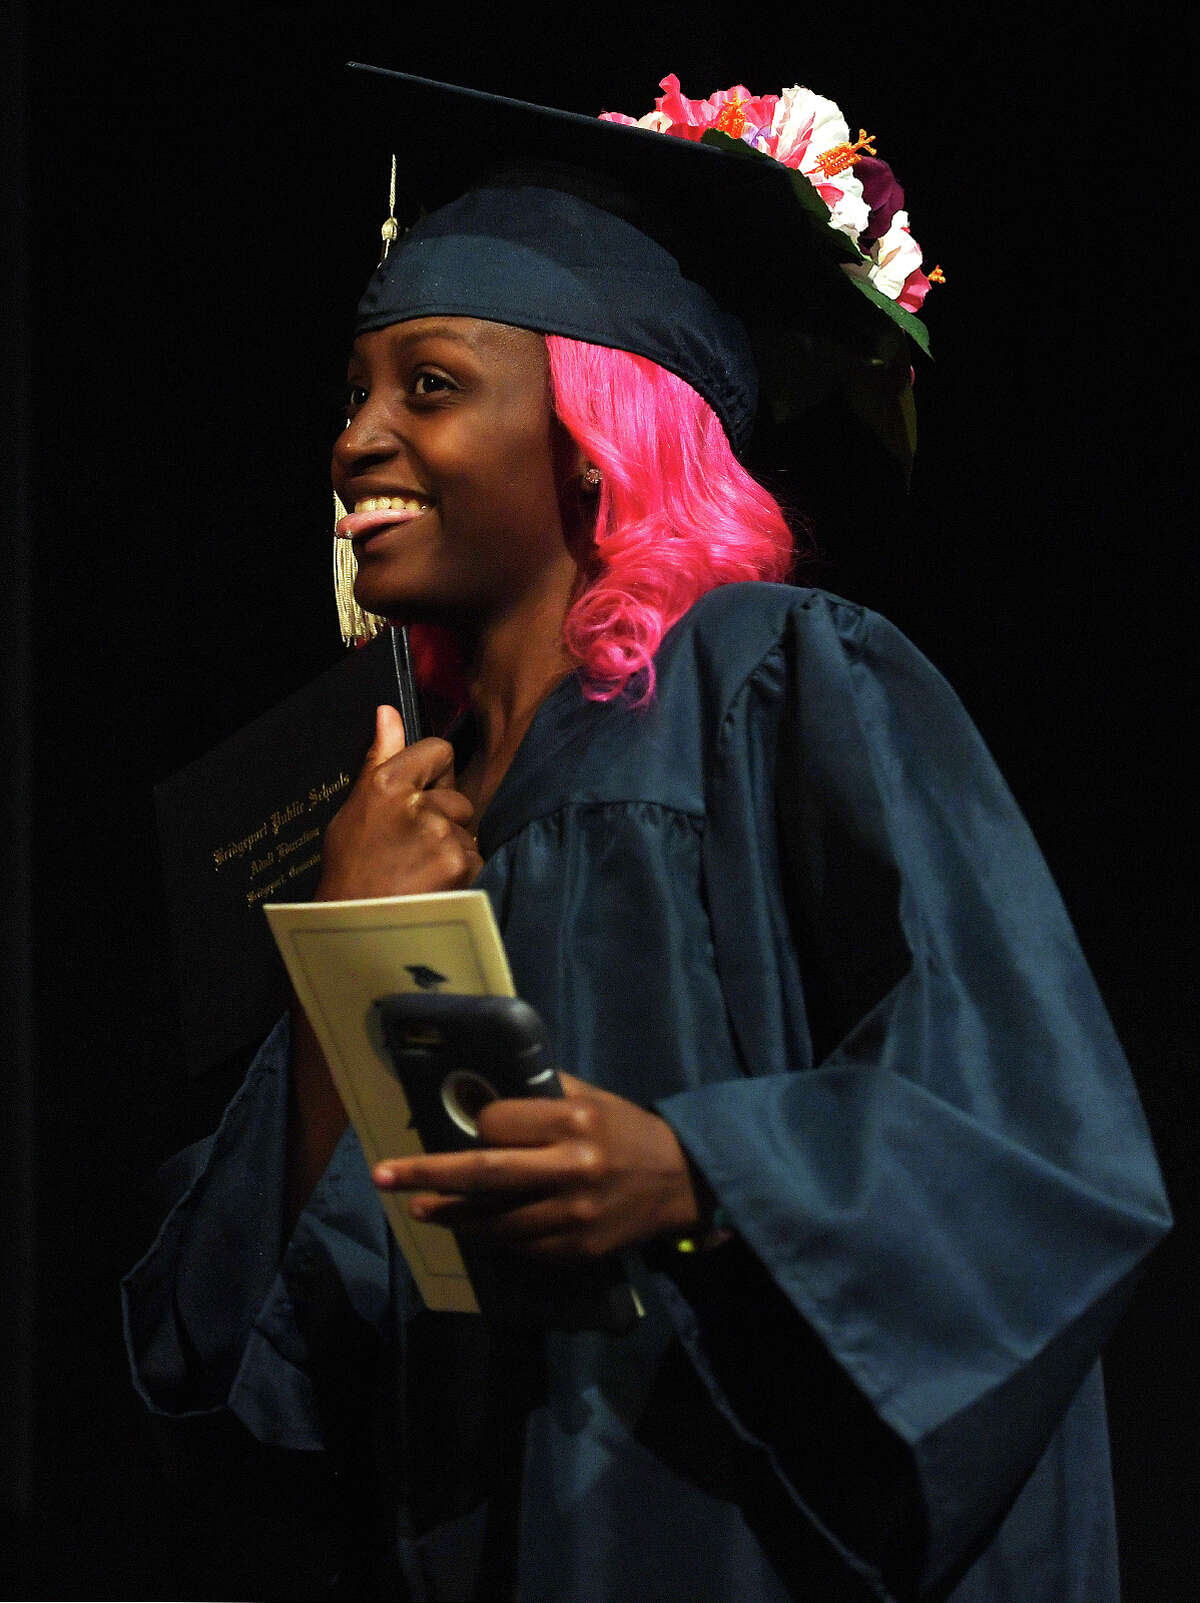 The Bridgeport Adult Education Graduation at the Klein Memorial Auditorium in Bridgeport, Conn. on Tuesday, June 3, 2019.